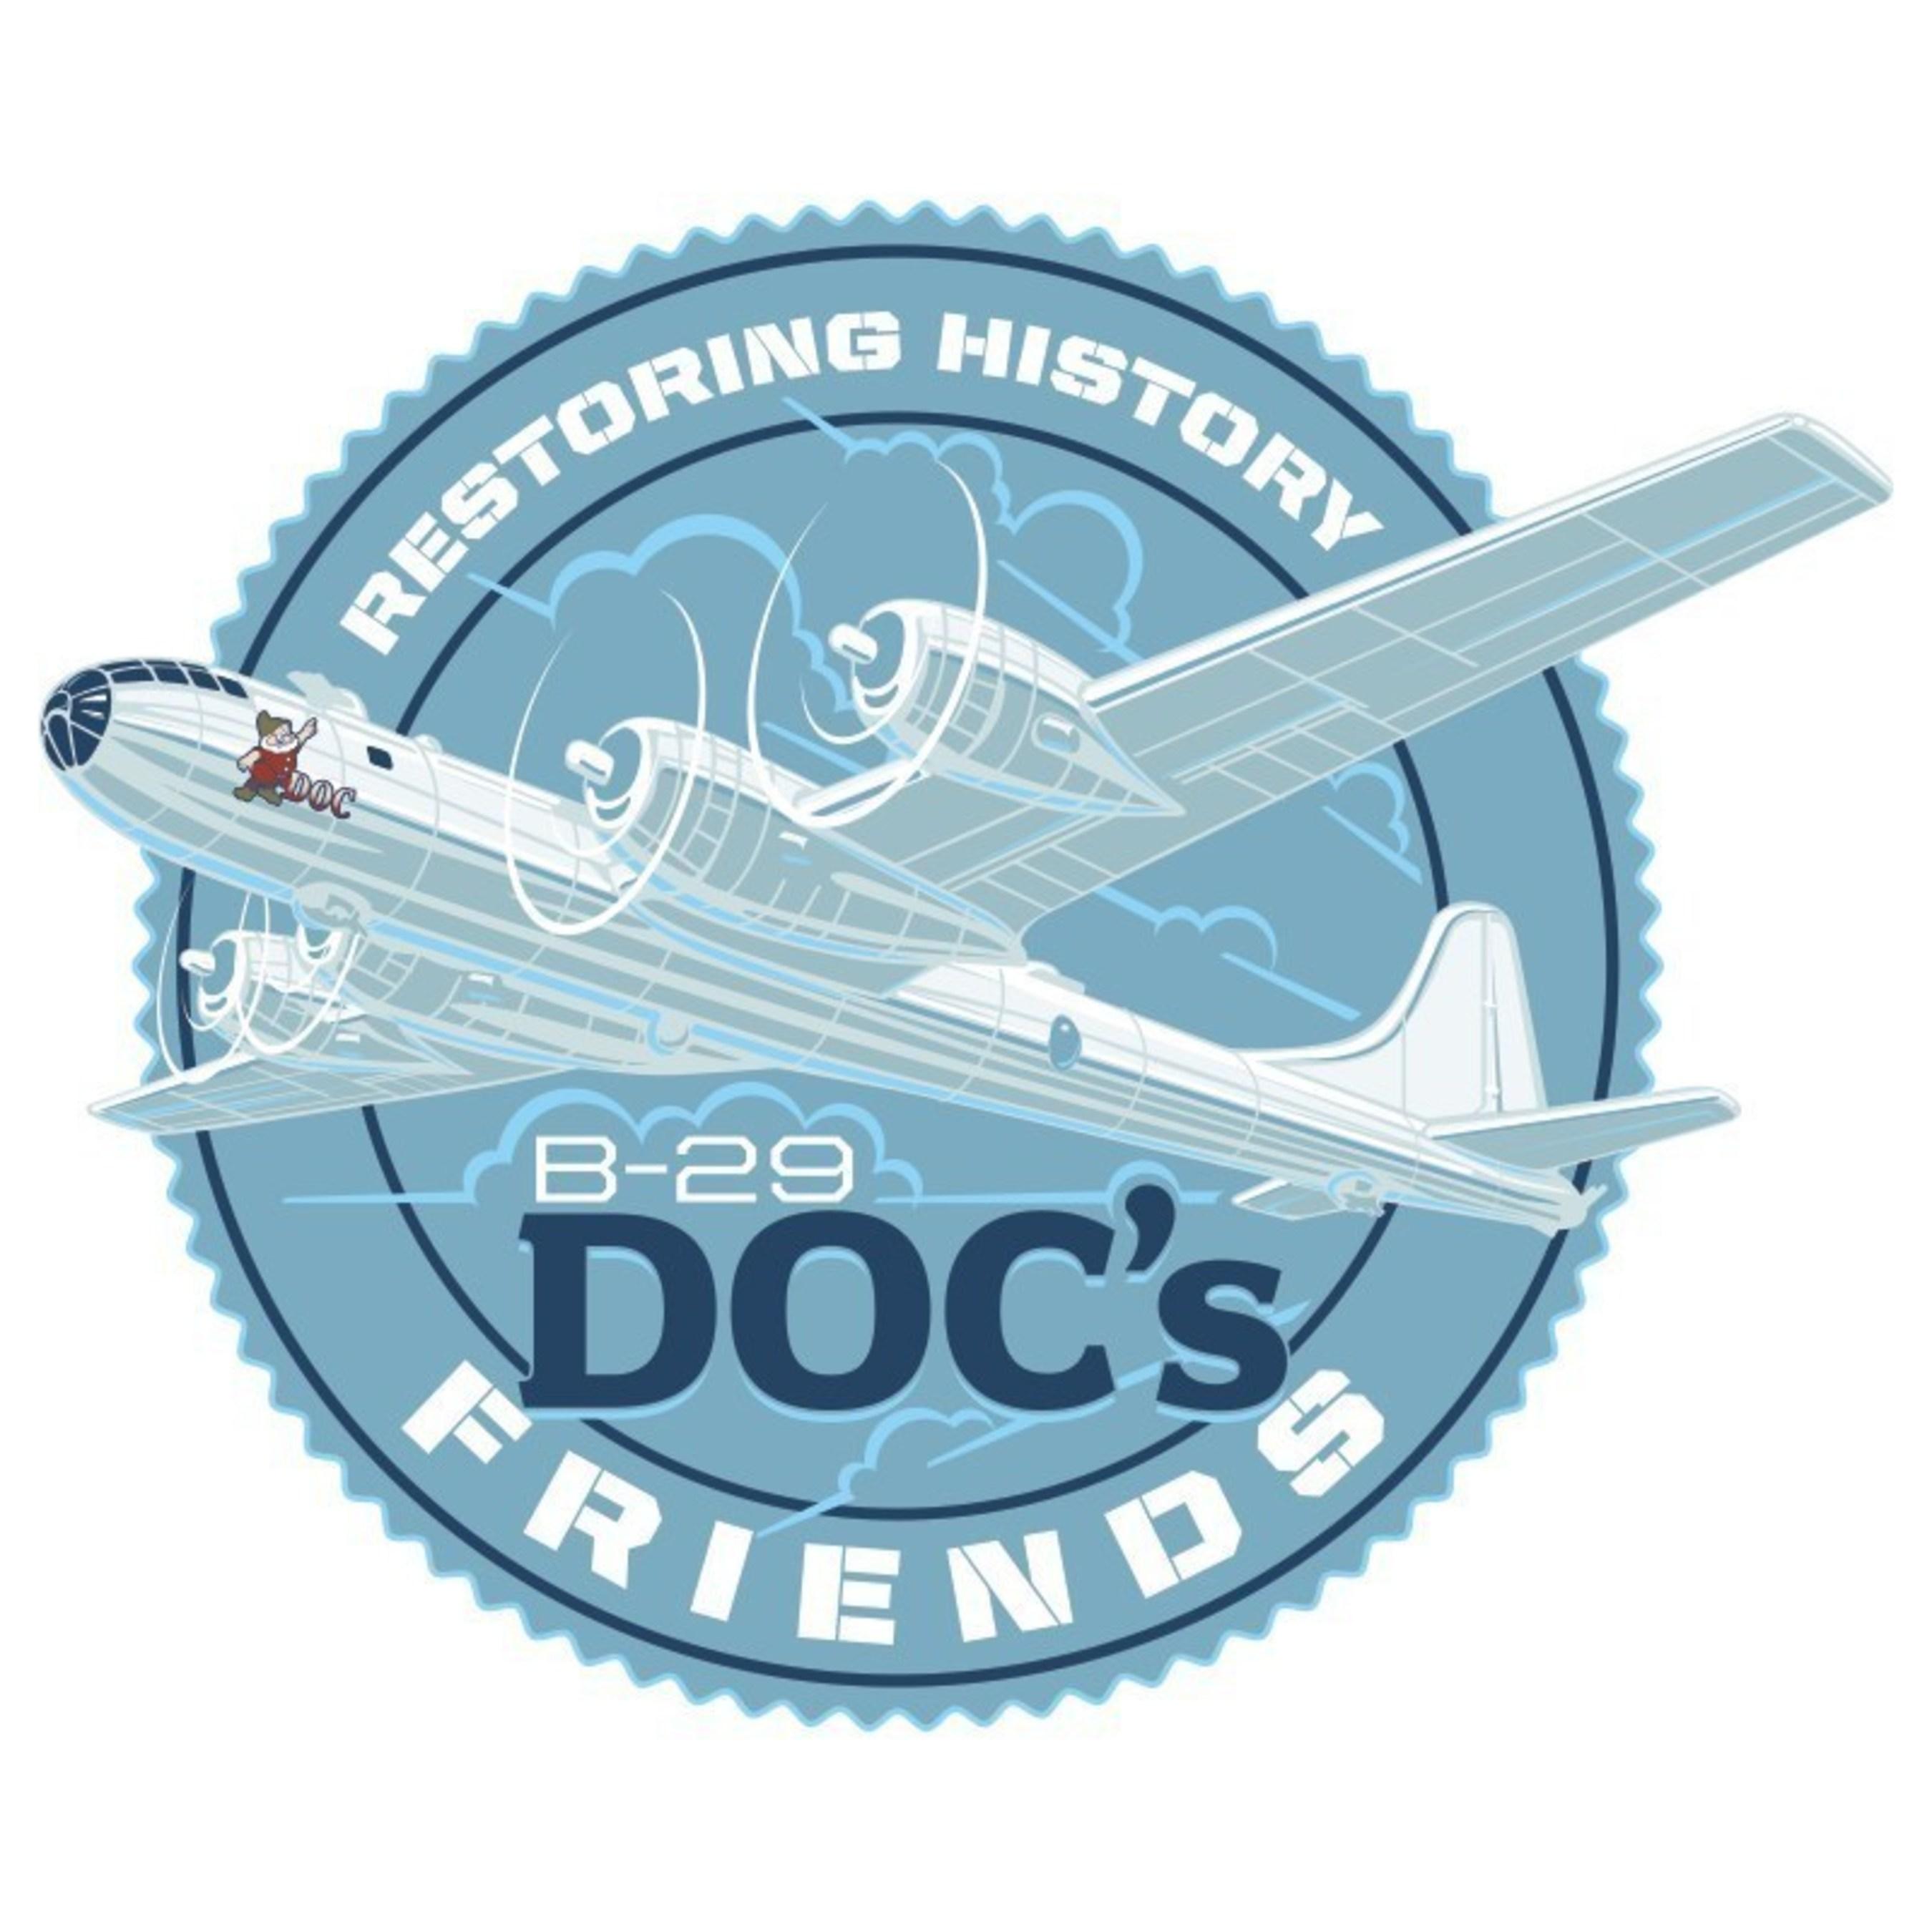 B-29 Doc Exceeds Kickstarter Goal to Fund Flight Testing